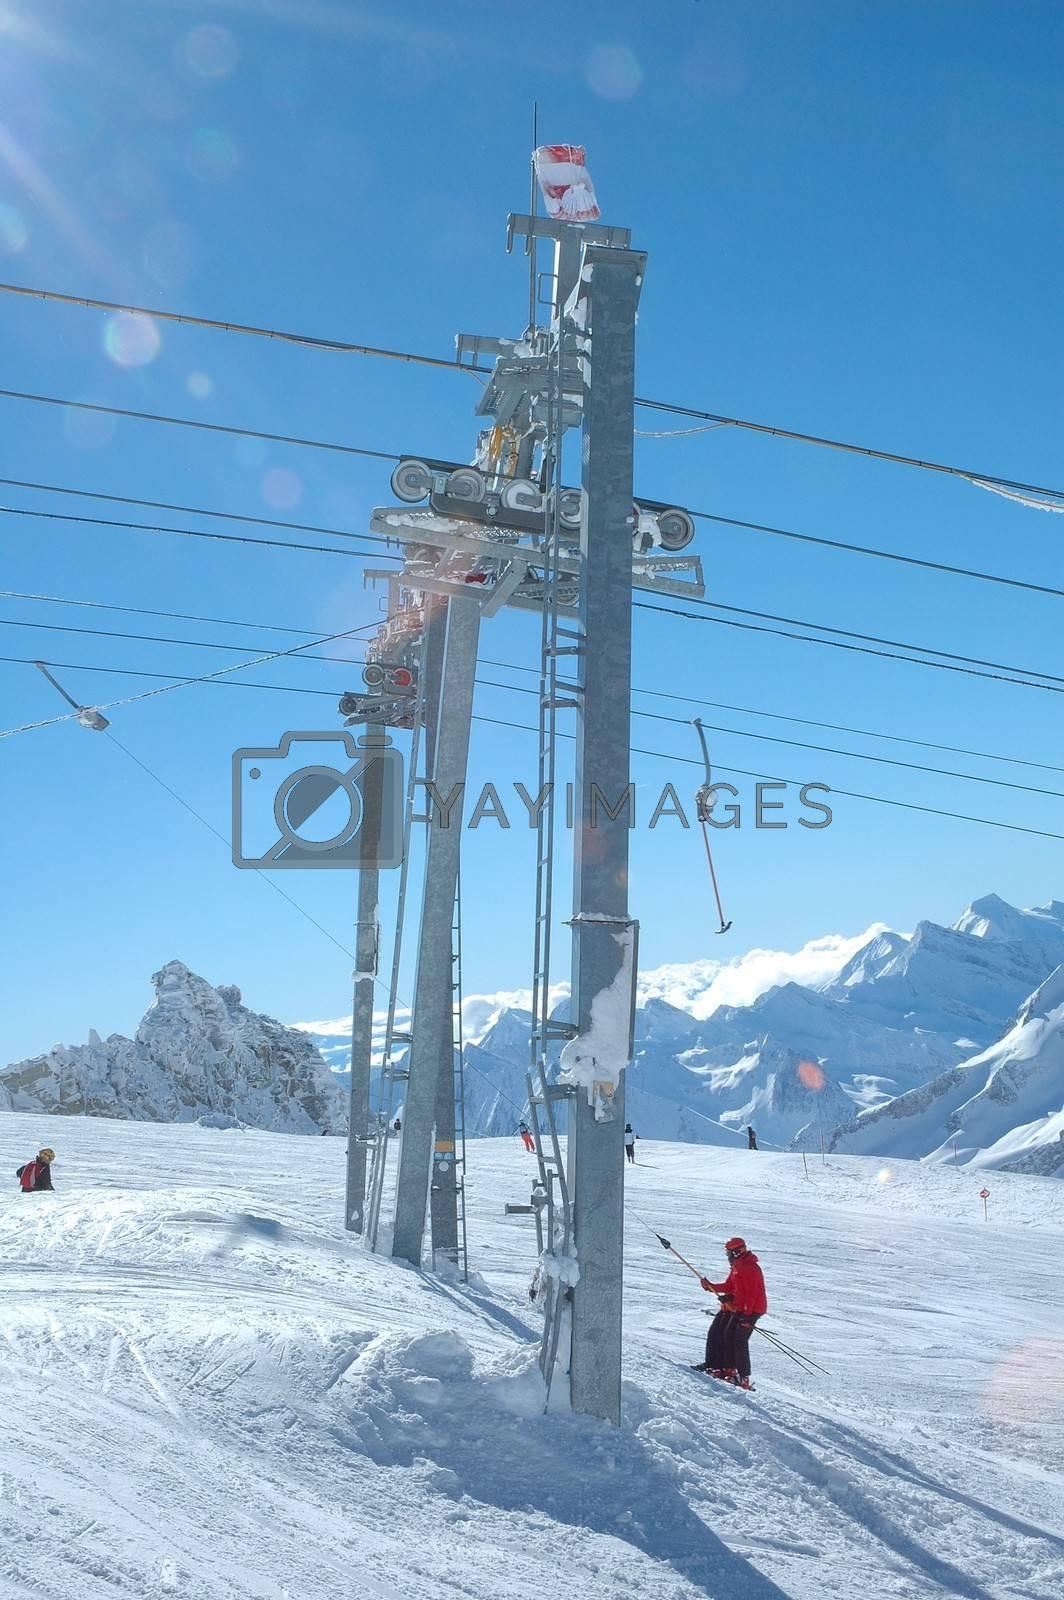 Drag lift on Hintertux glacier nearby Zillertal valley in Austria